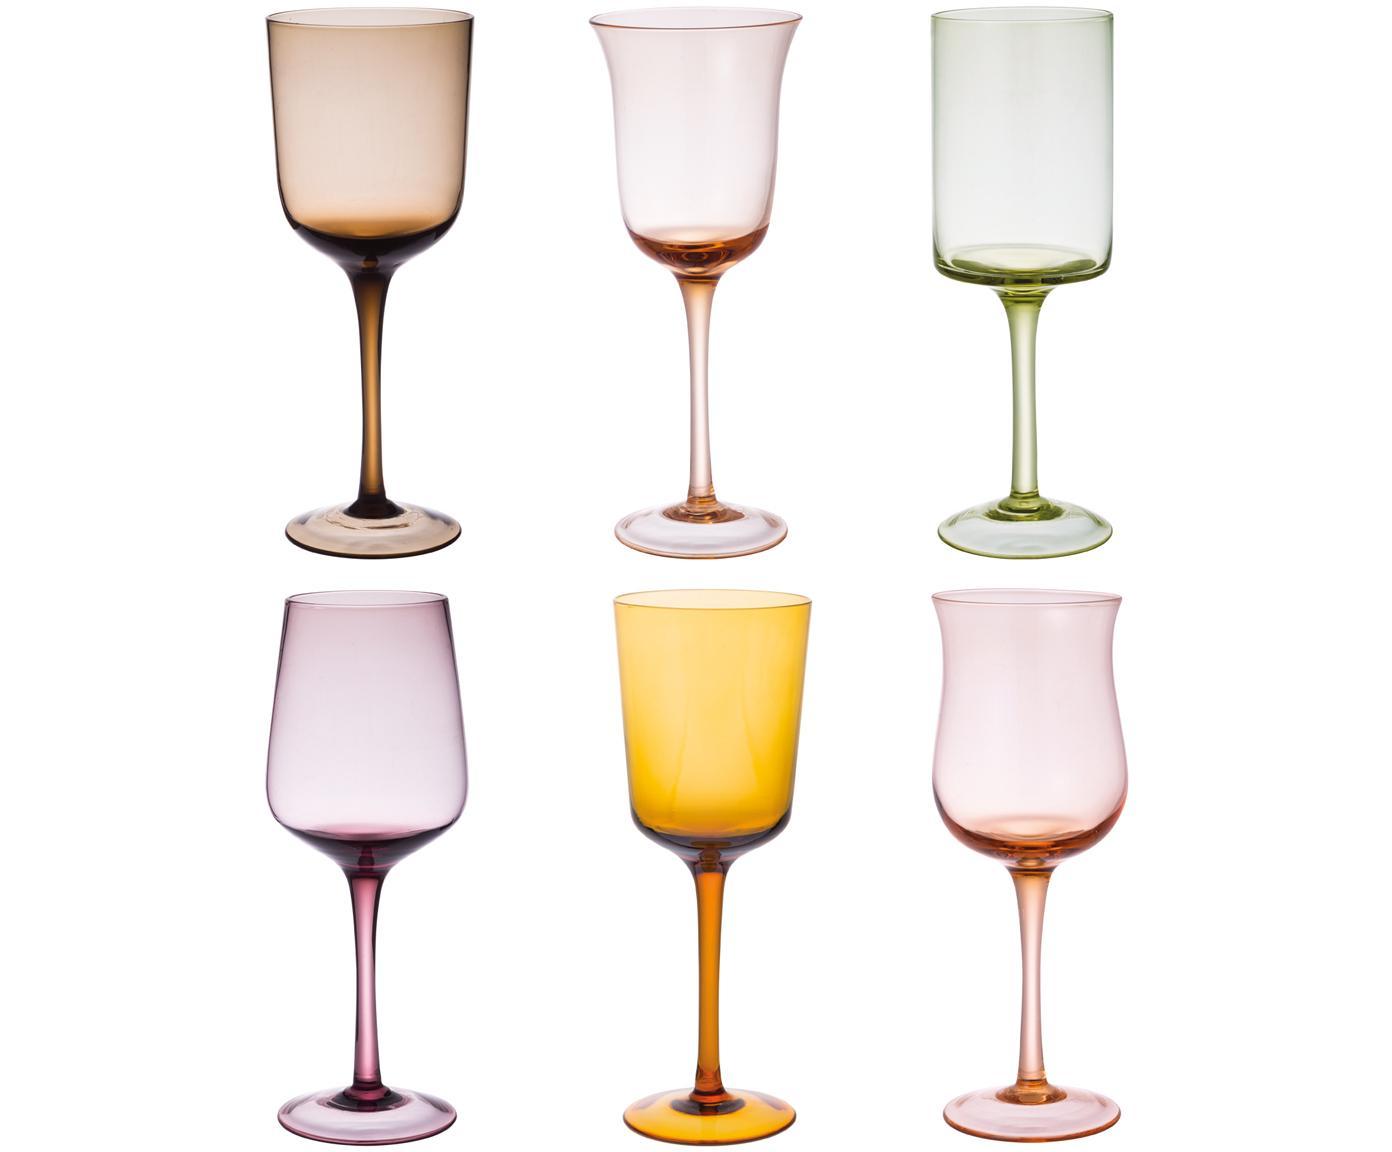 Mundgeblasene Weingläser Desigual in Bunt, 6er-Set, Glas, mundgeblasen, Braun, Rosatöne, Grün, Gelb, Lila, Ø 7 cm